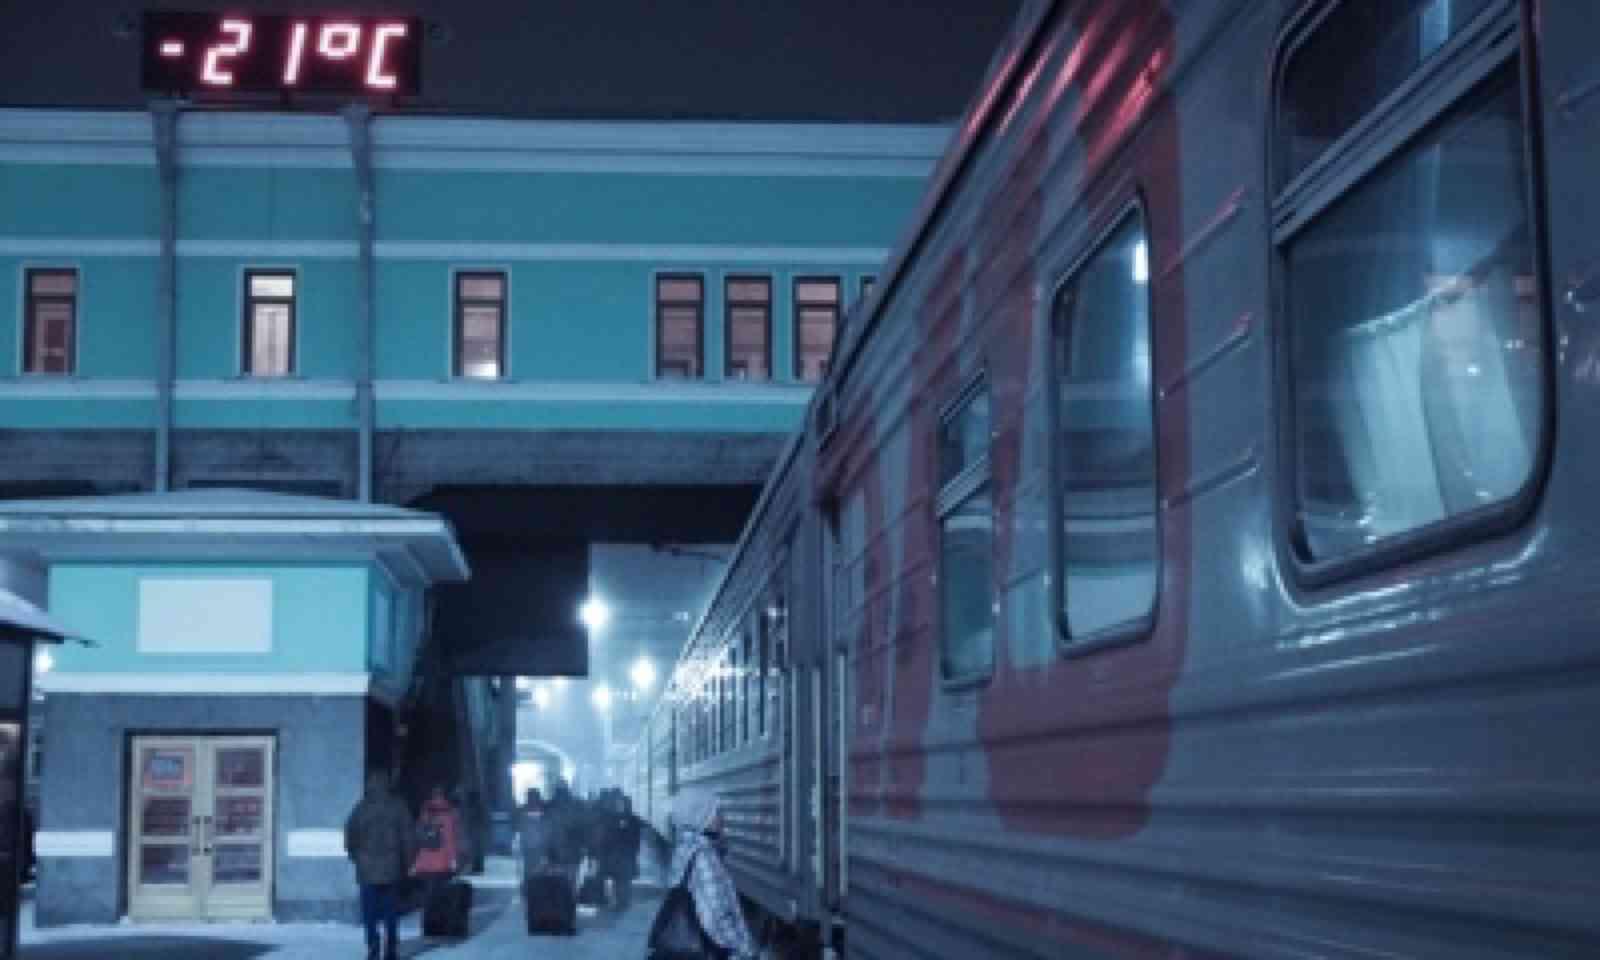 Ice cold in Novosibirsk (Matthew Woodward)